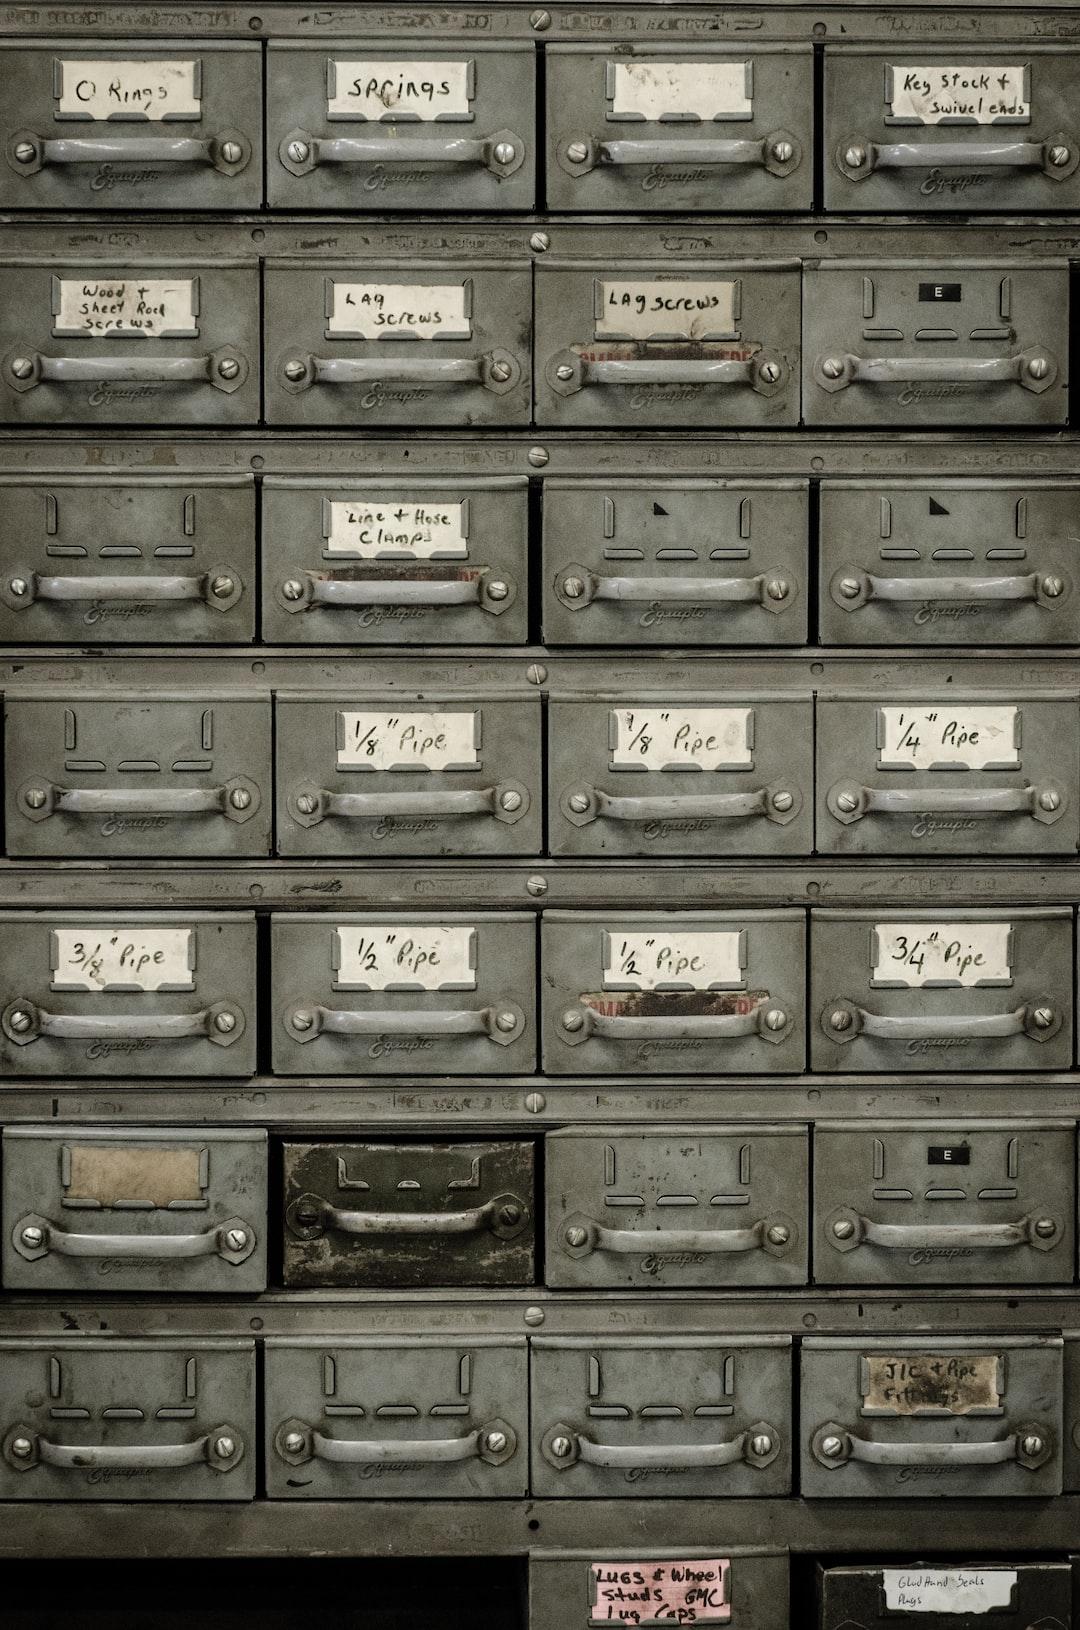 Organized document cabinet